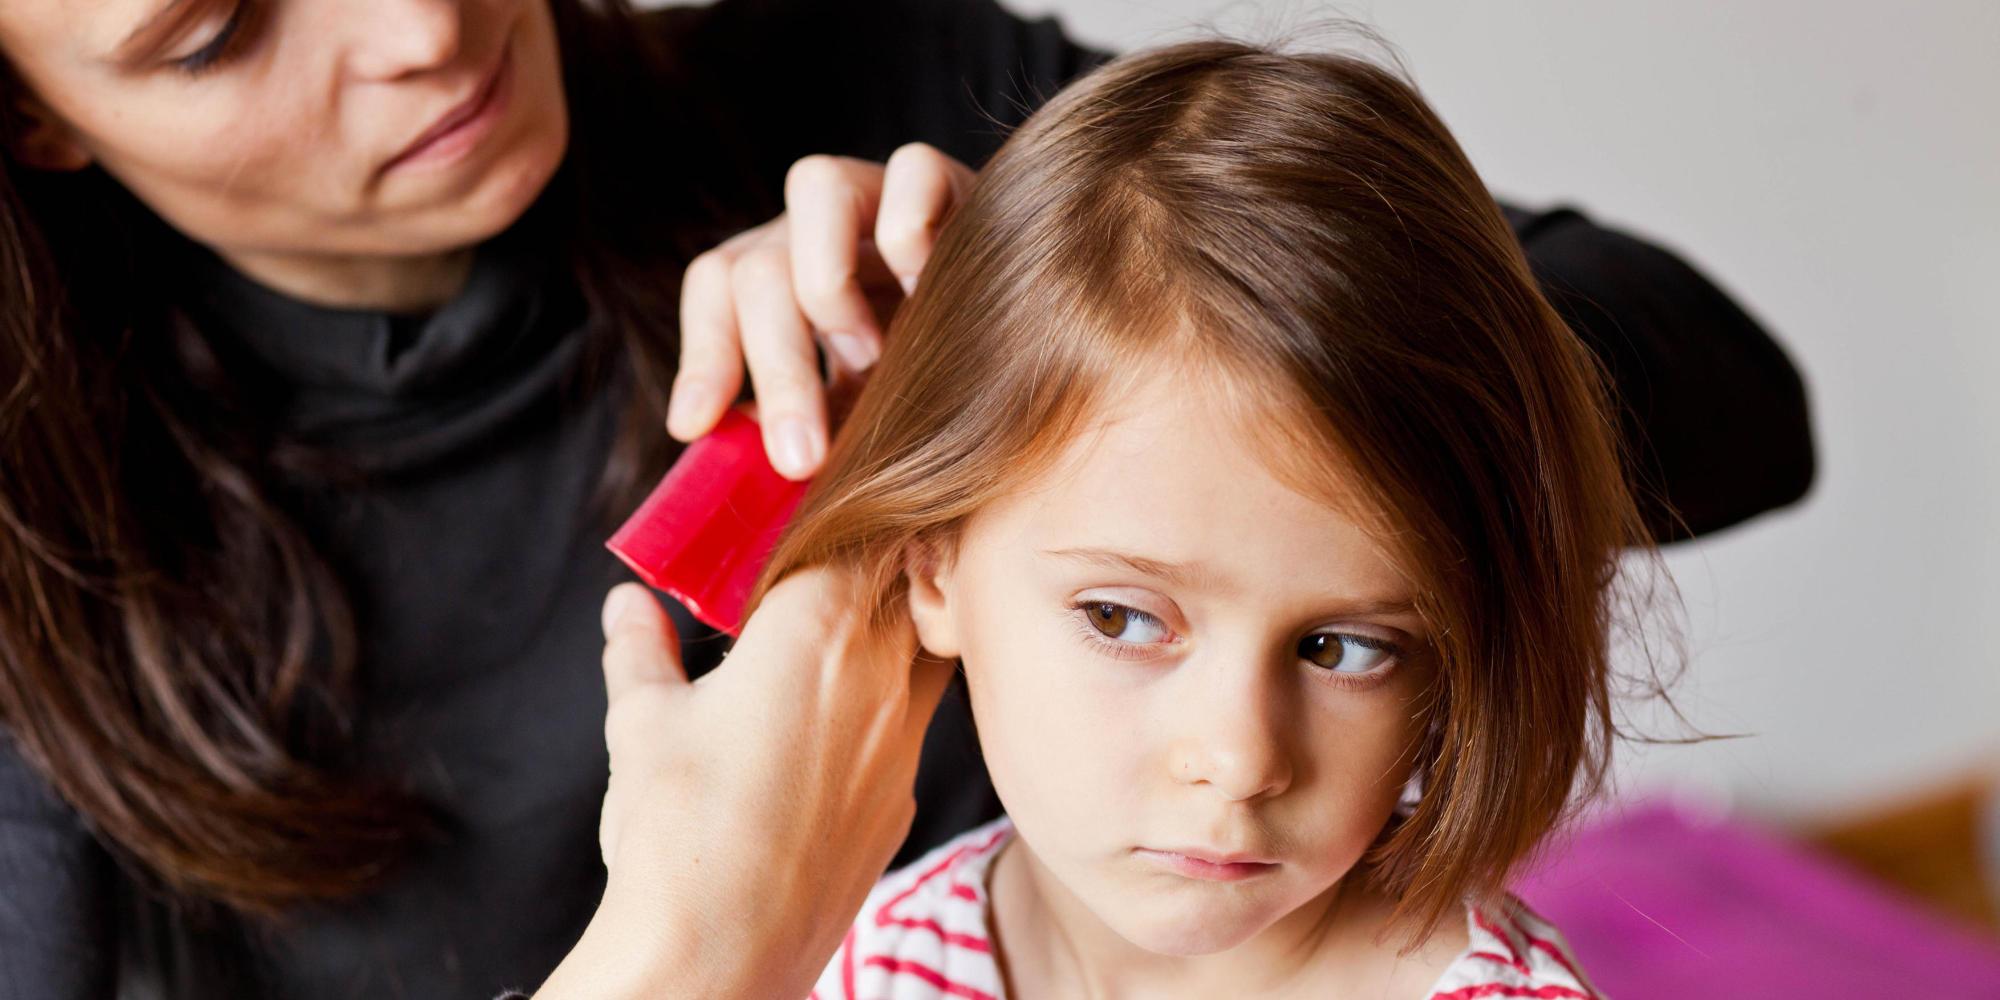 genitori preoccupati e apprensivi